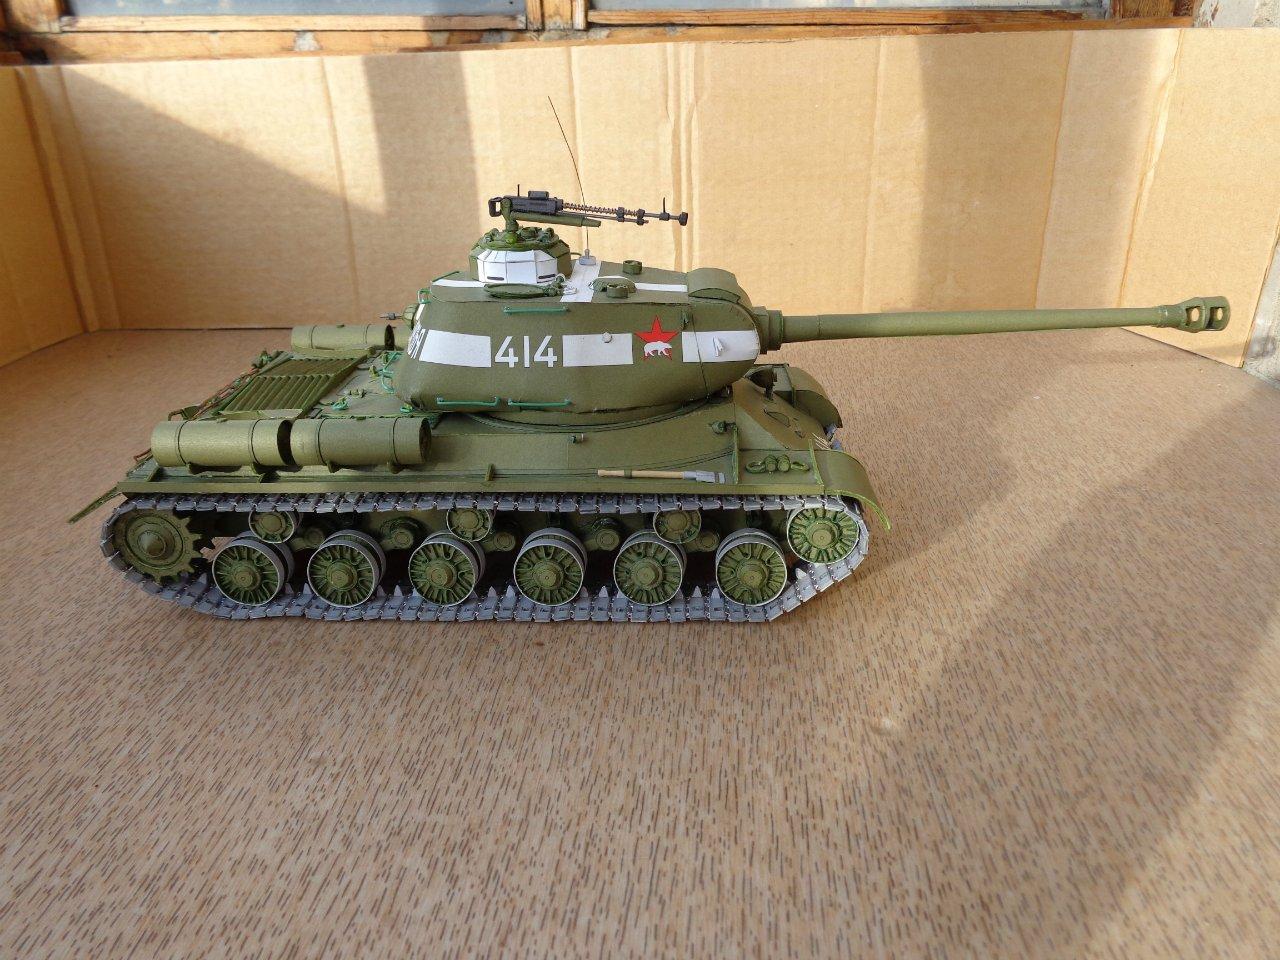 фото танка из бумаги виде серьги